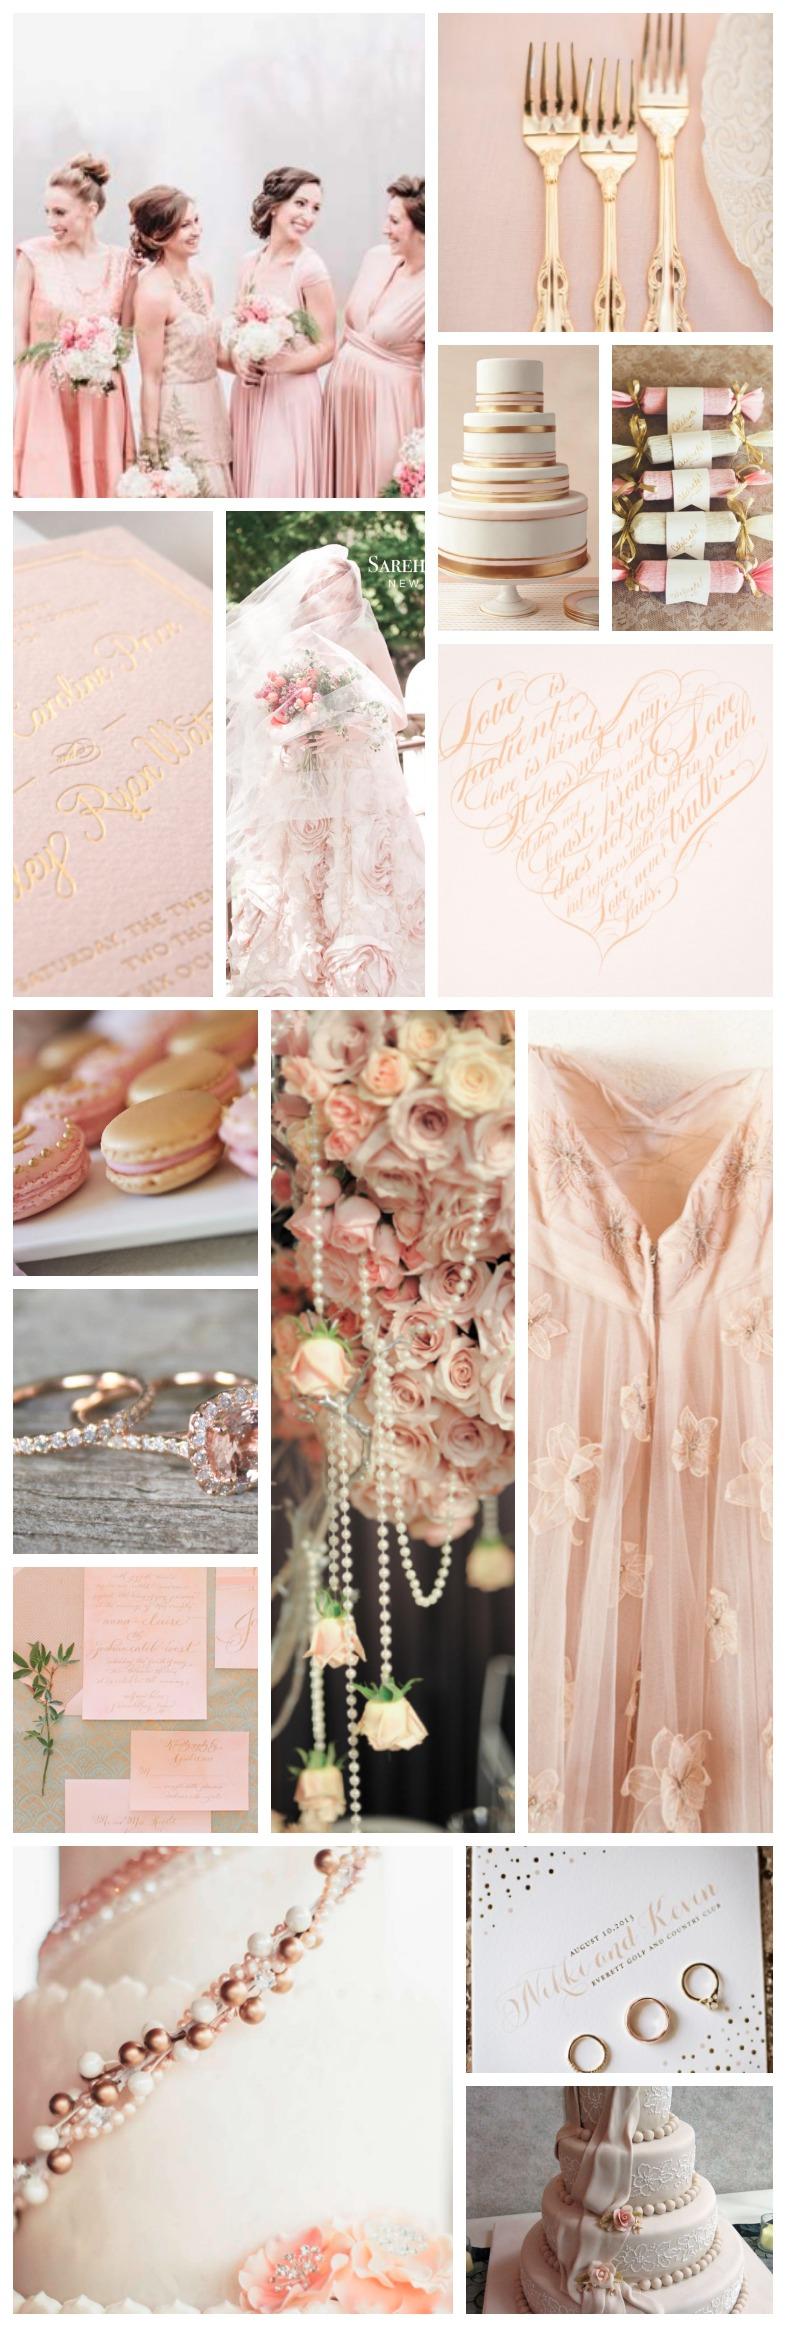 rose, blush and gold wedding palette inspiration board